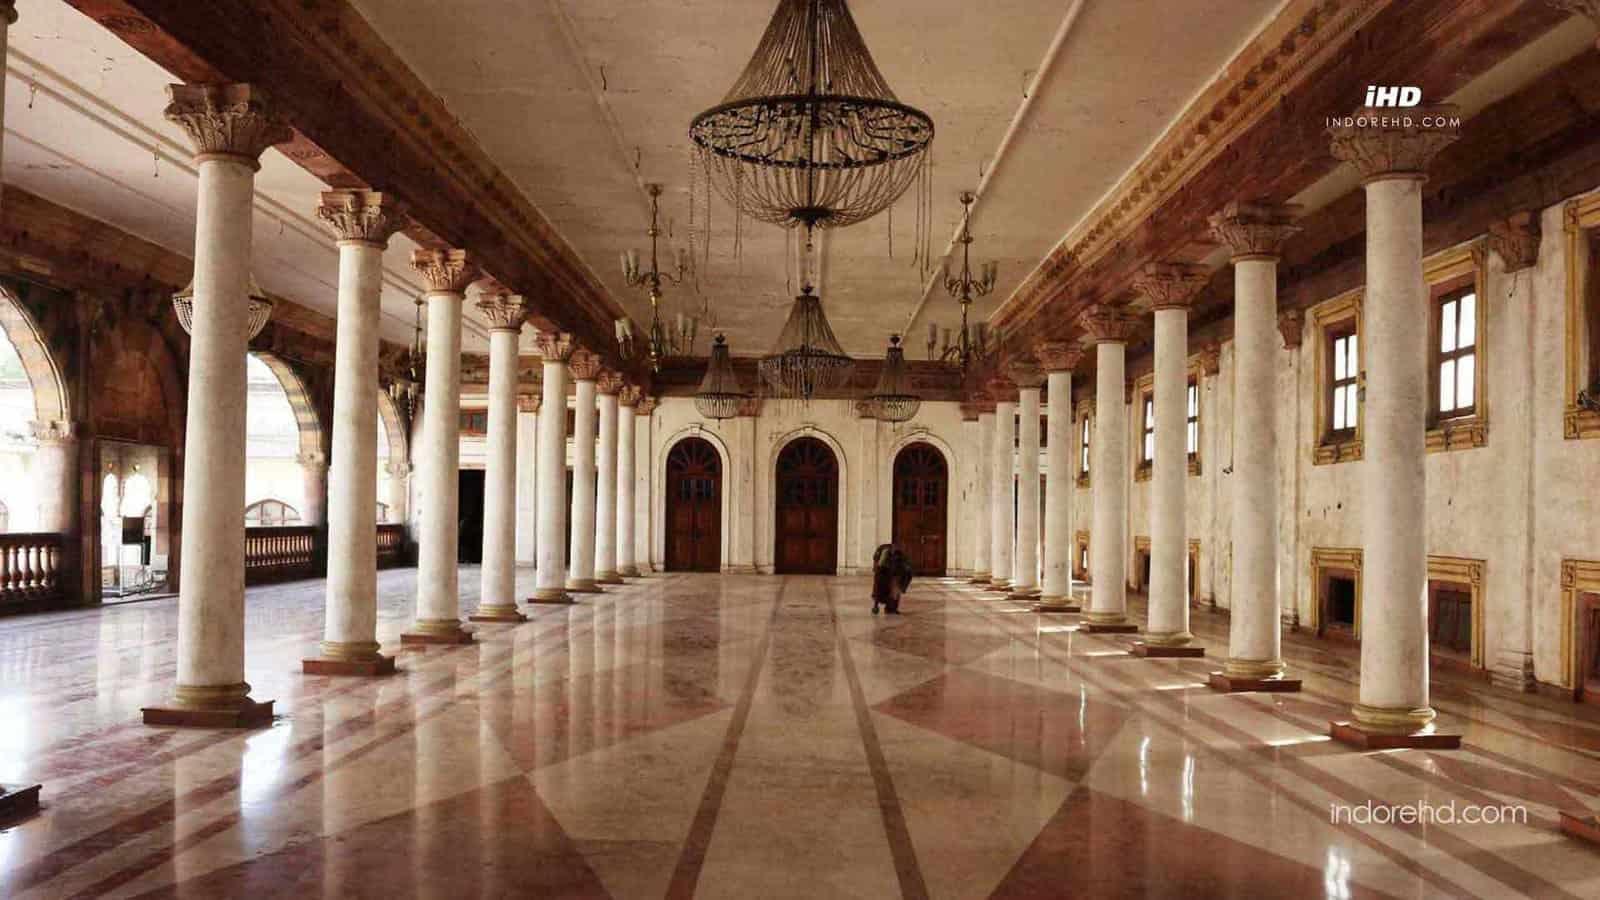 inside-tour-rajwada-indore-indorehd